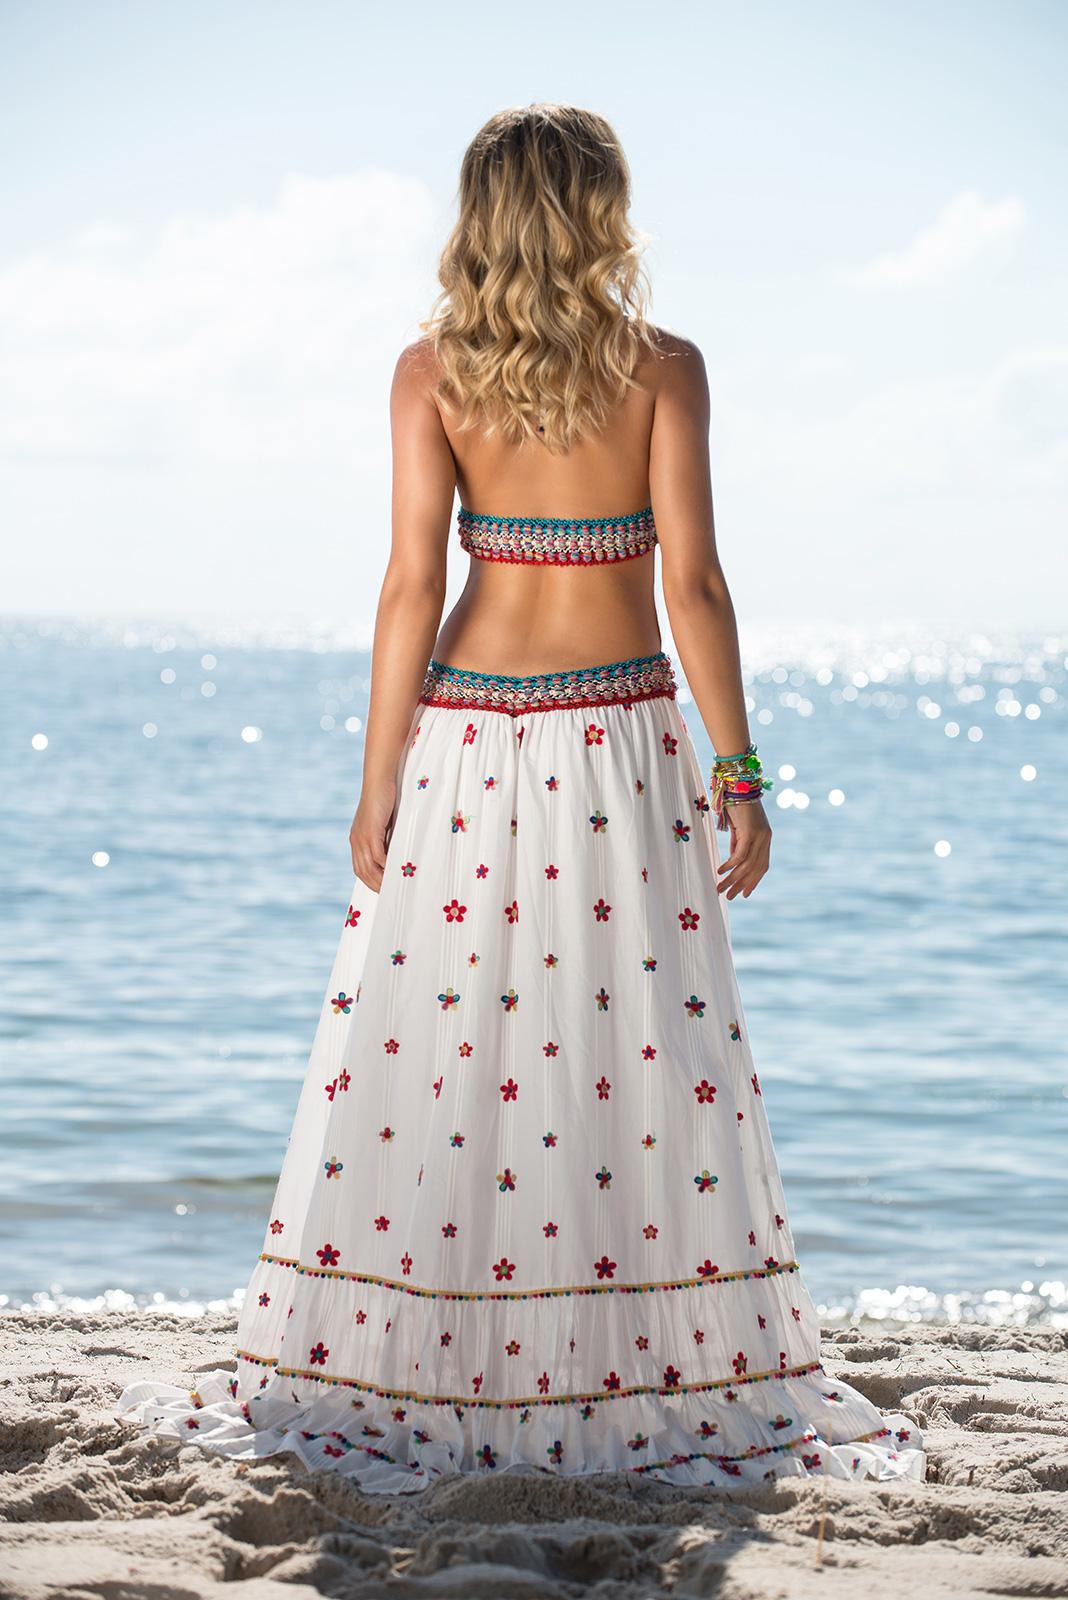 f25d8012a024 Long Flower-embroidered Boho-style Beach Dress - Daisy Long Dress ...